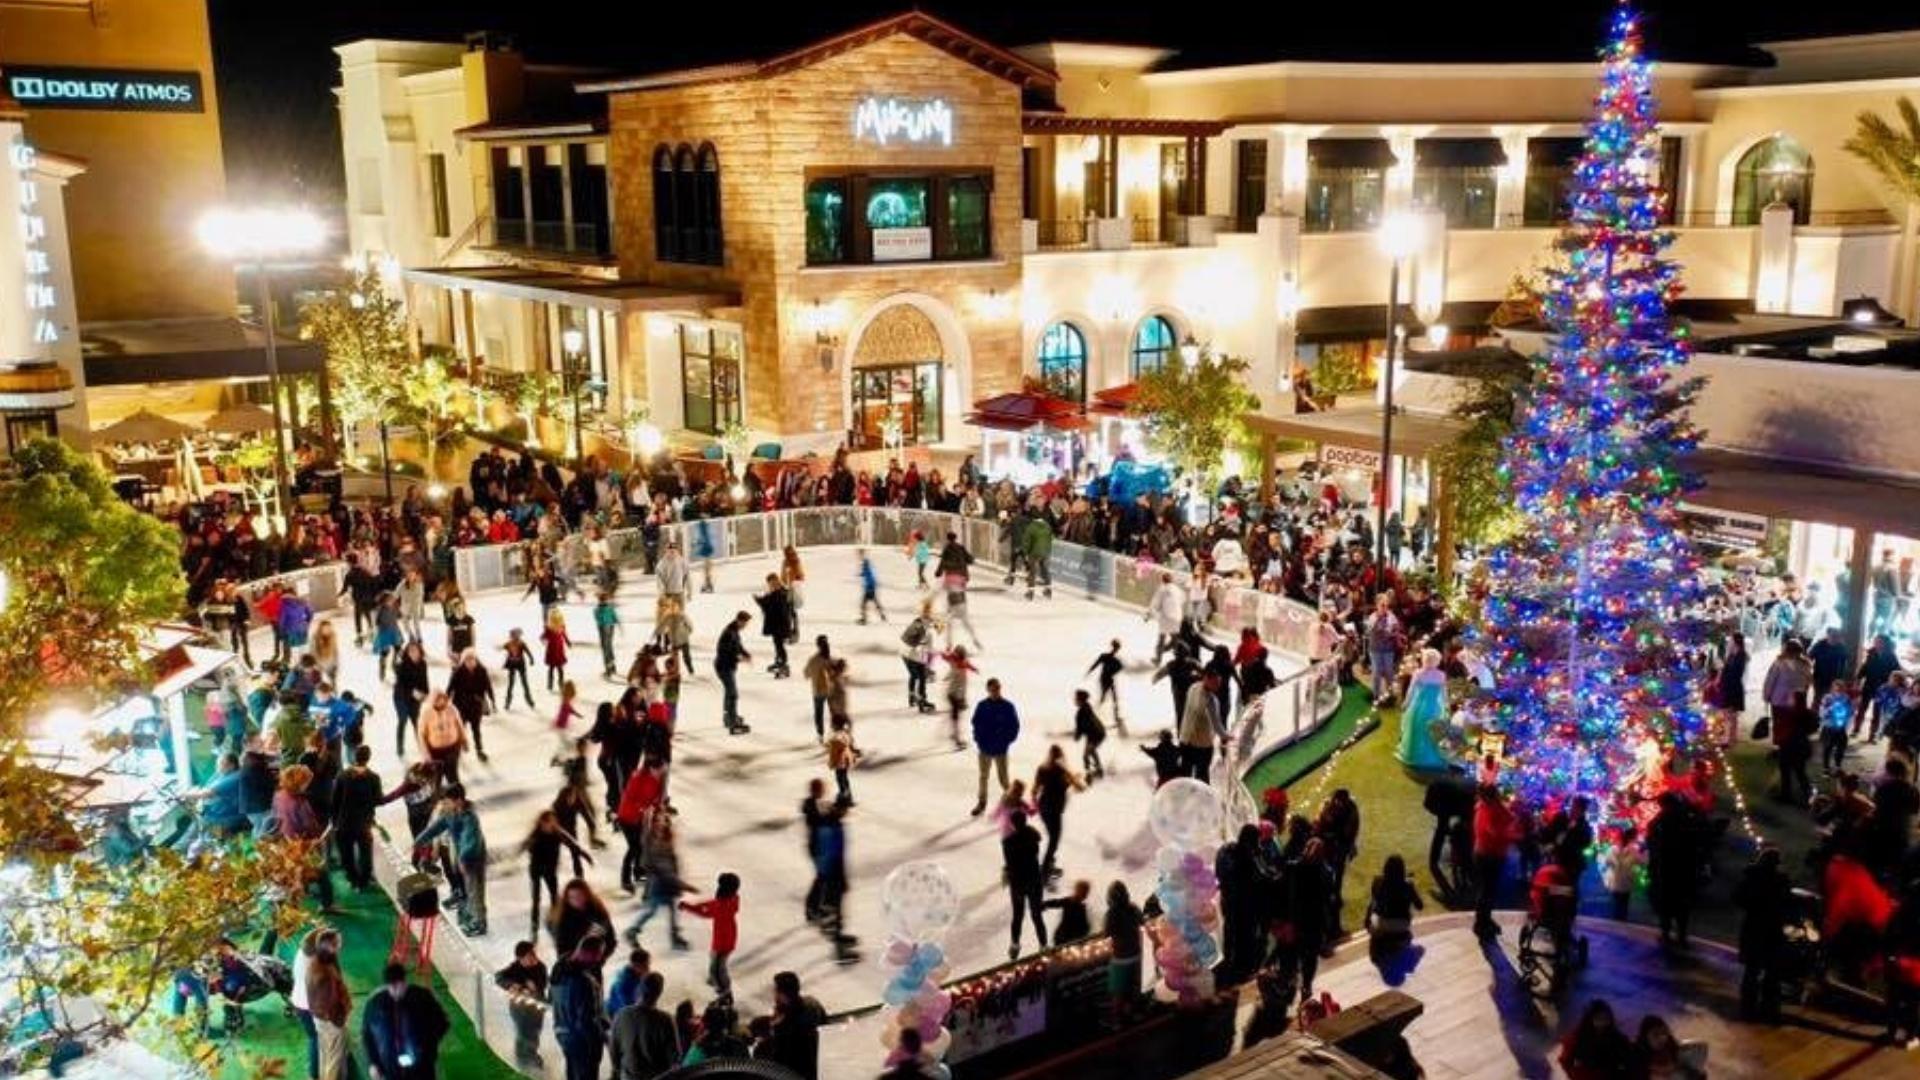 The Veranda Shopping Center Ice RInk